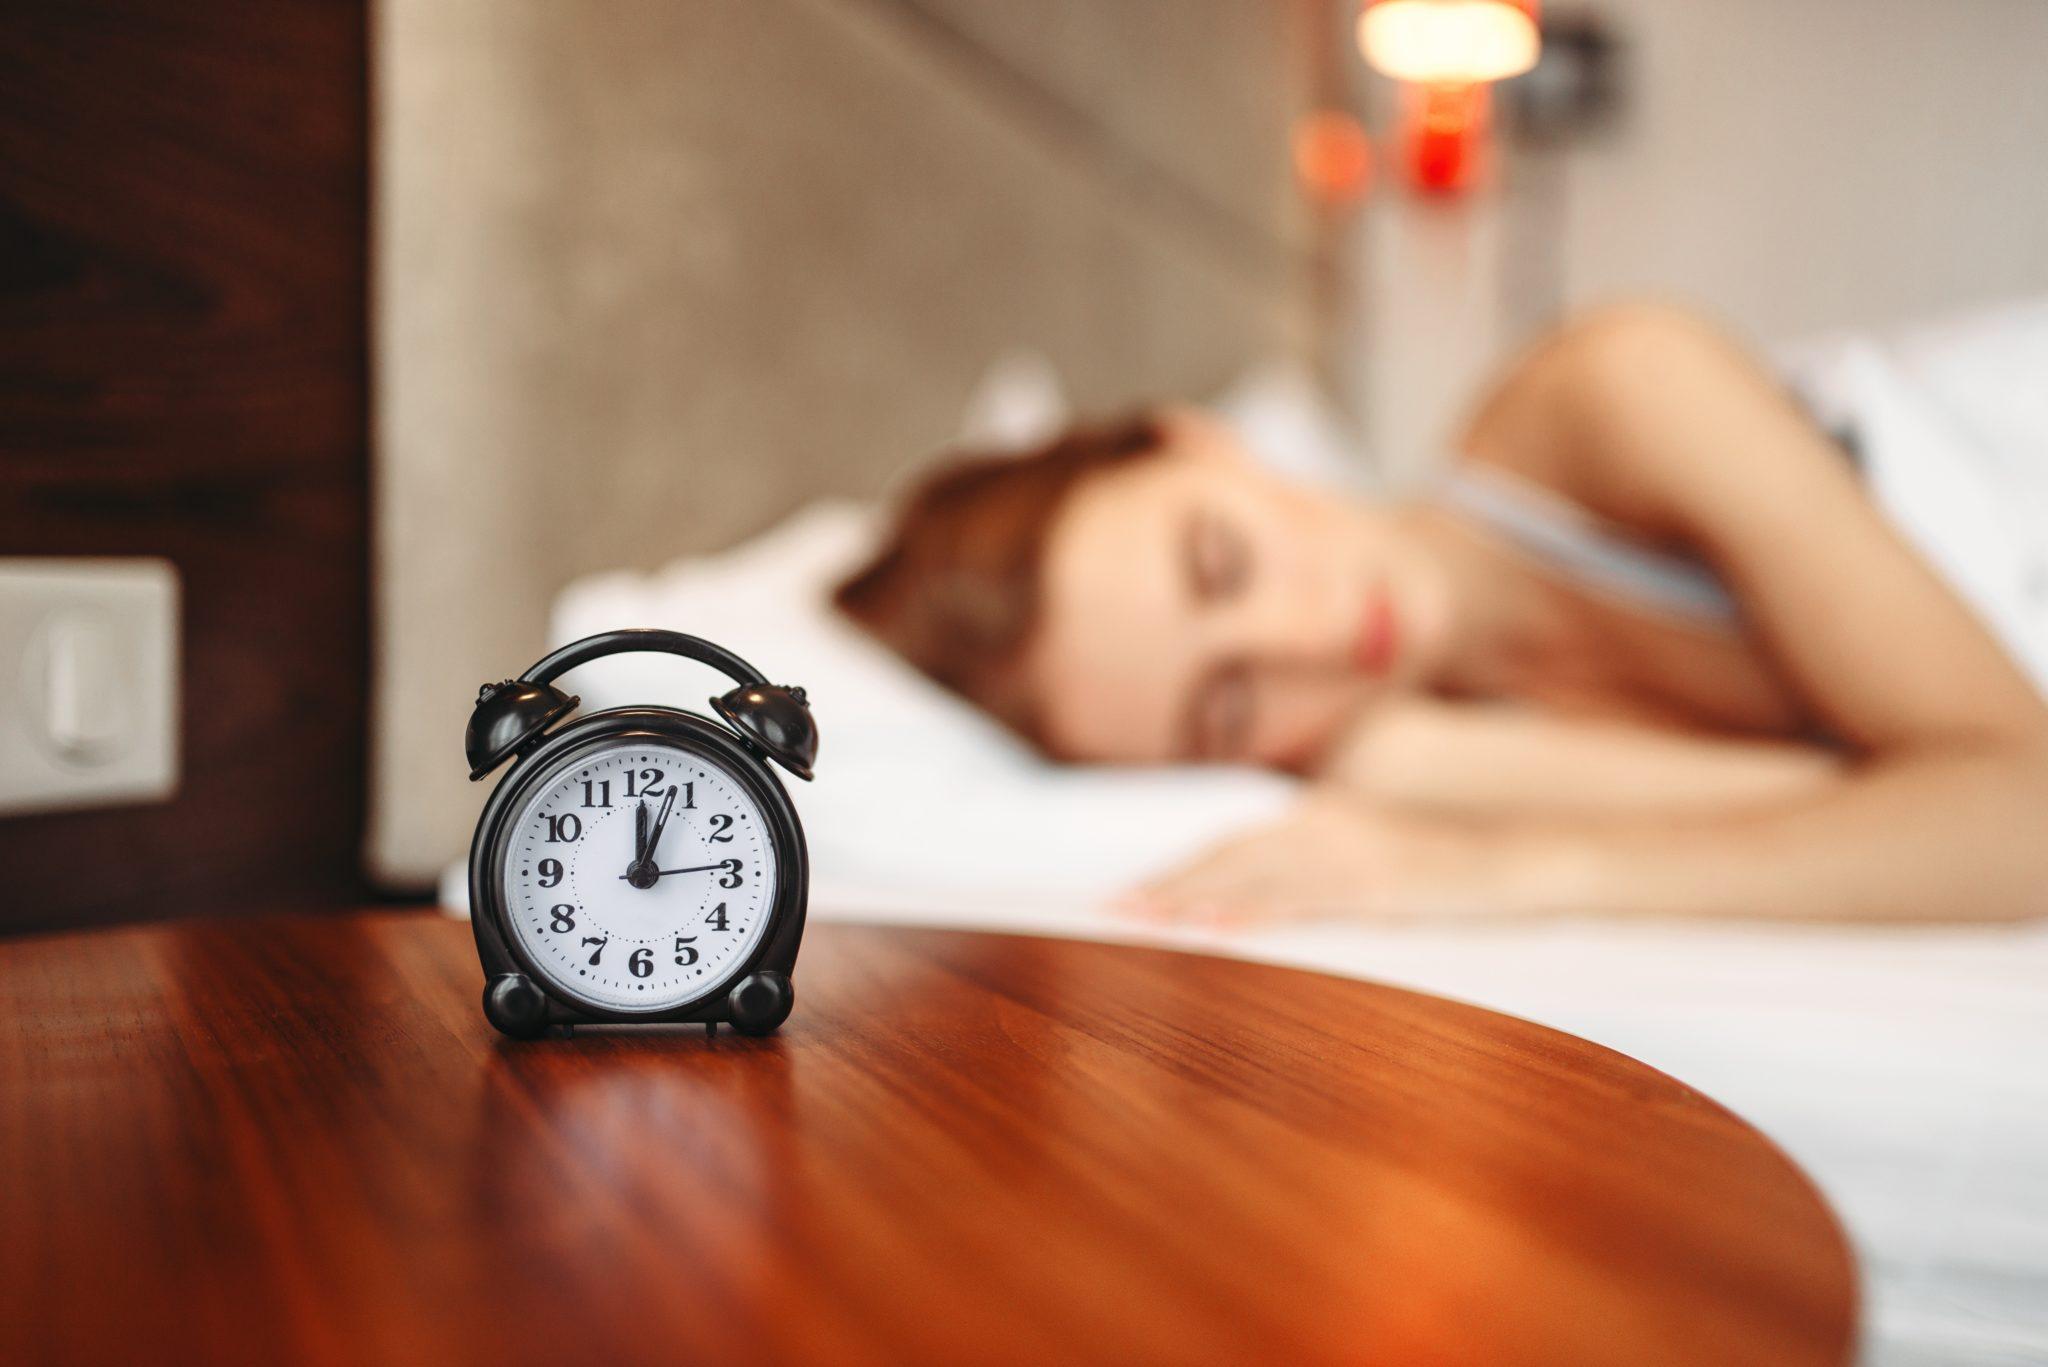 Daylight Savings Ends - How's Your Sleep? 3